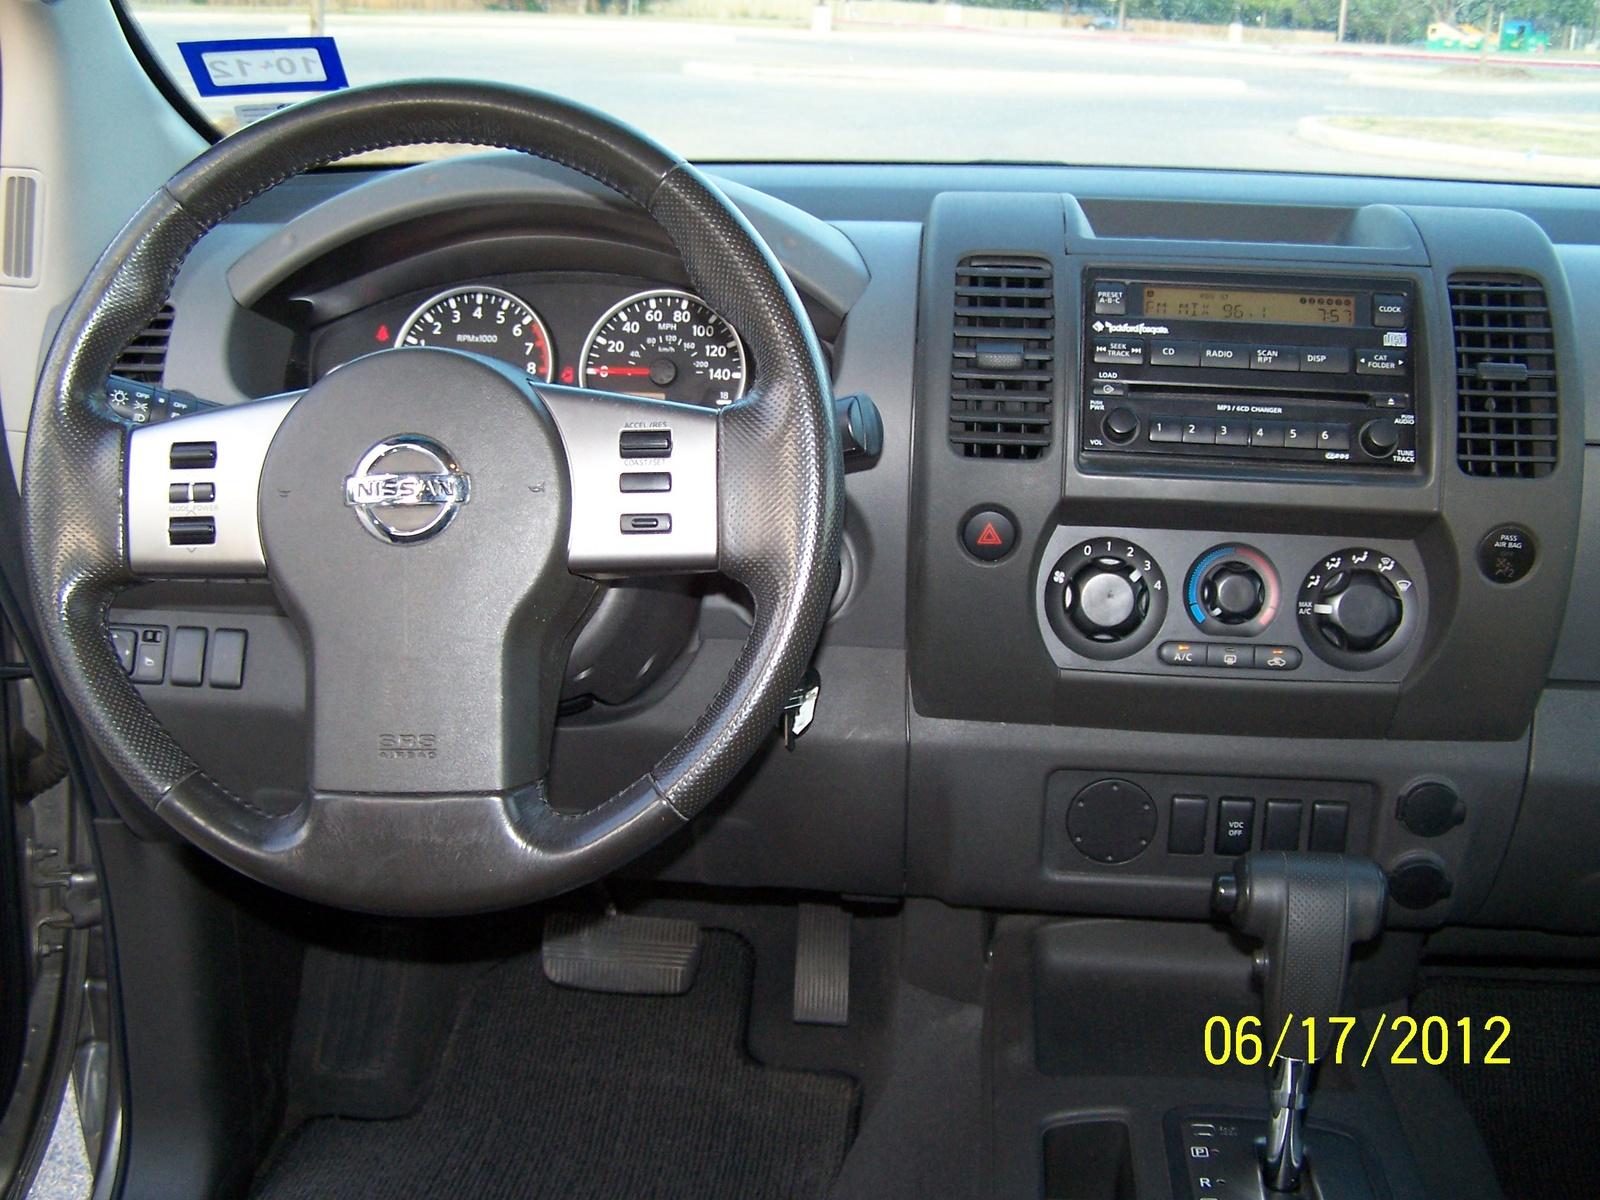 Nissan Xterra 2006 Interior